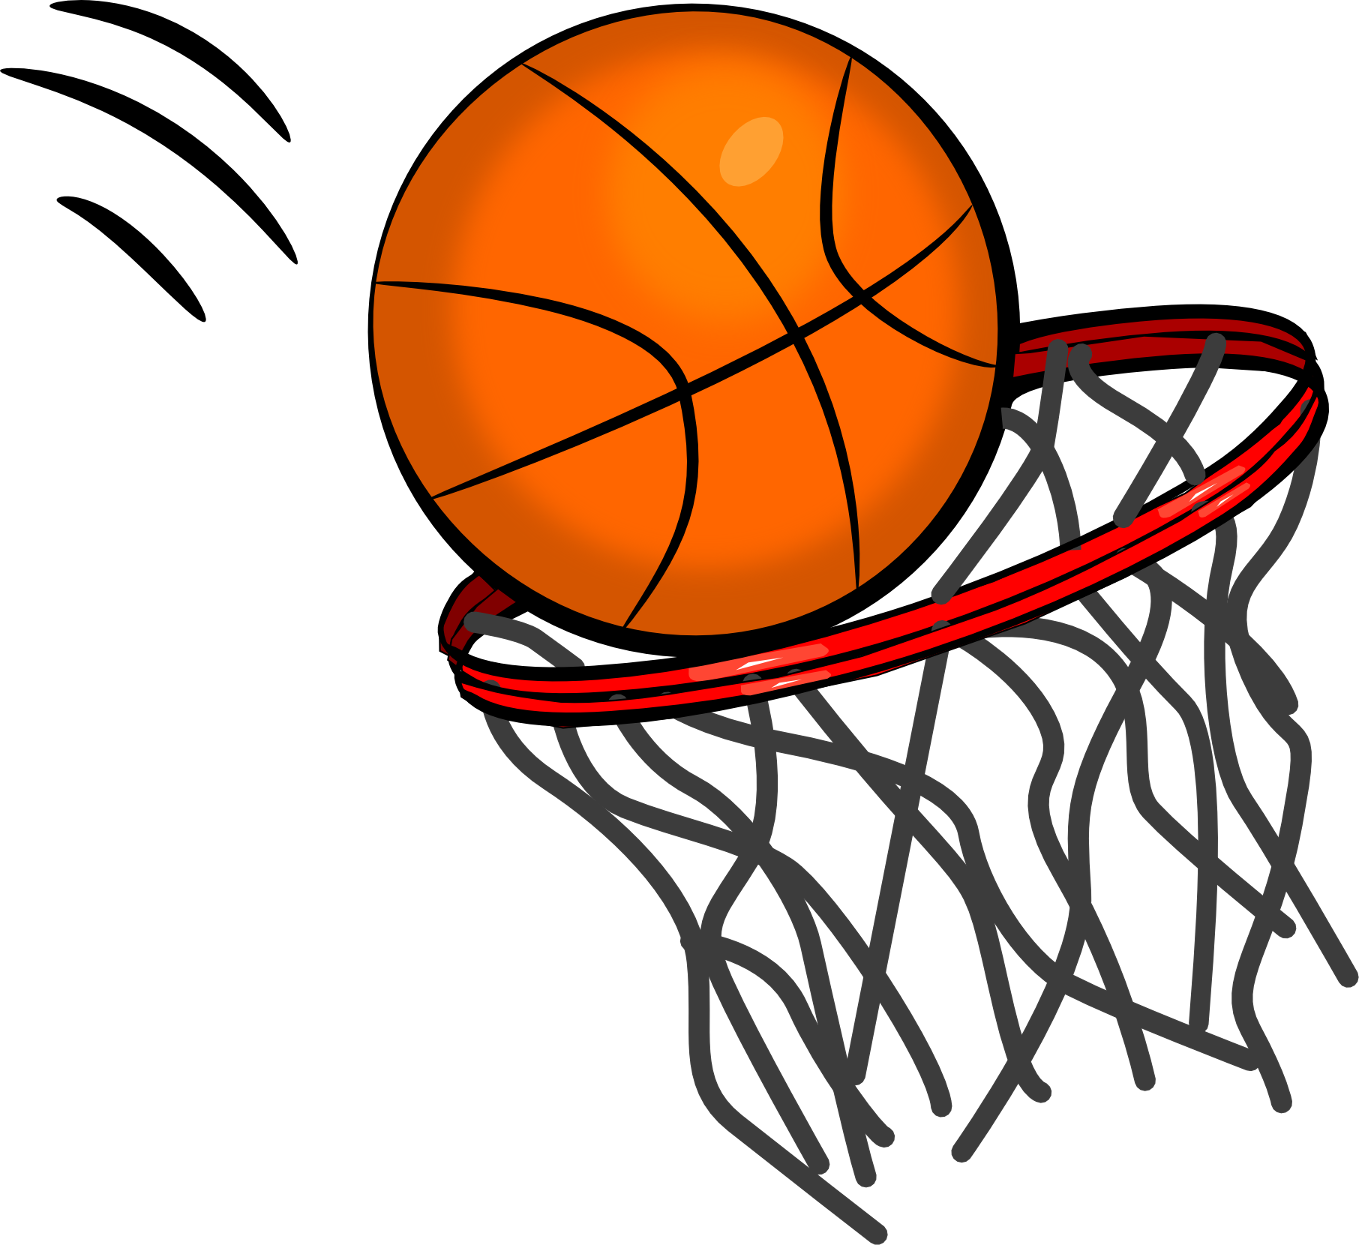 Basketball Rim Png - ClipArt Best